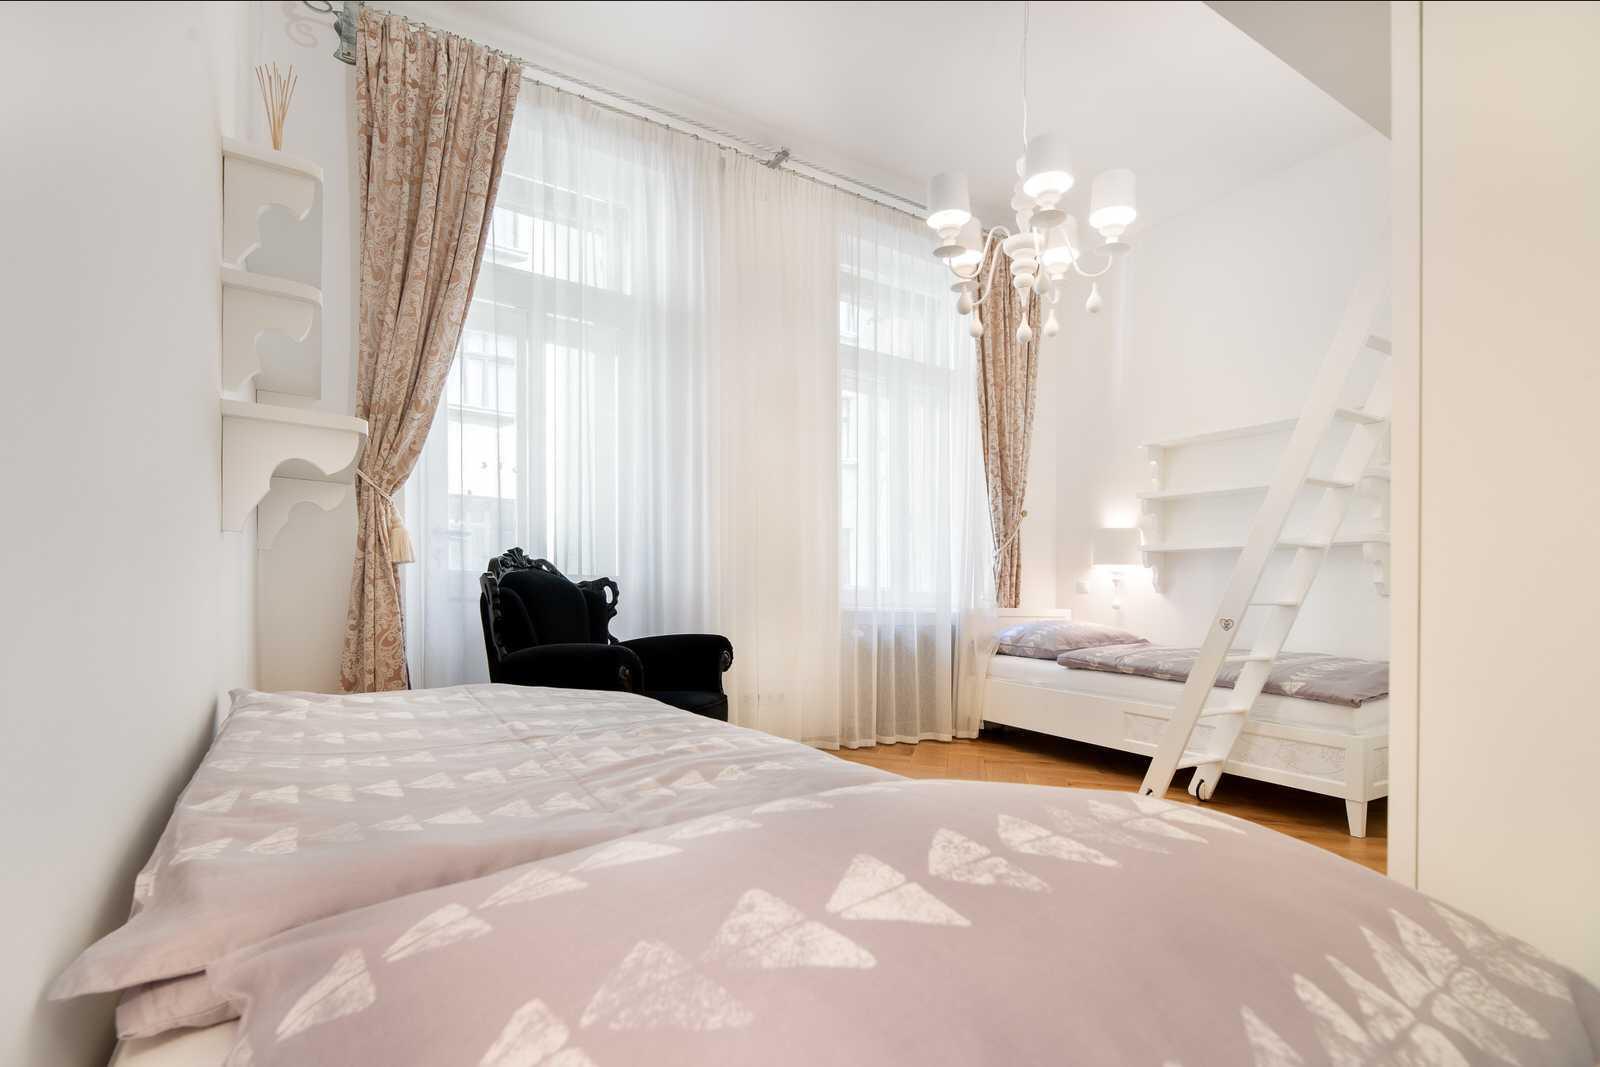 Ljubljana 2-bedroom Beethovnova apartment's twin bedroom with a gallery and a balcony